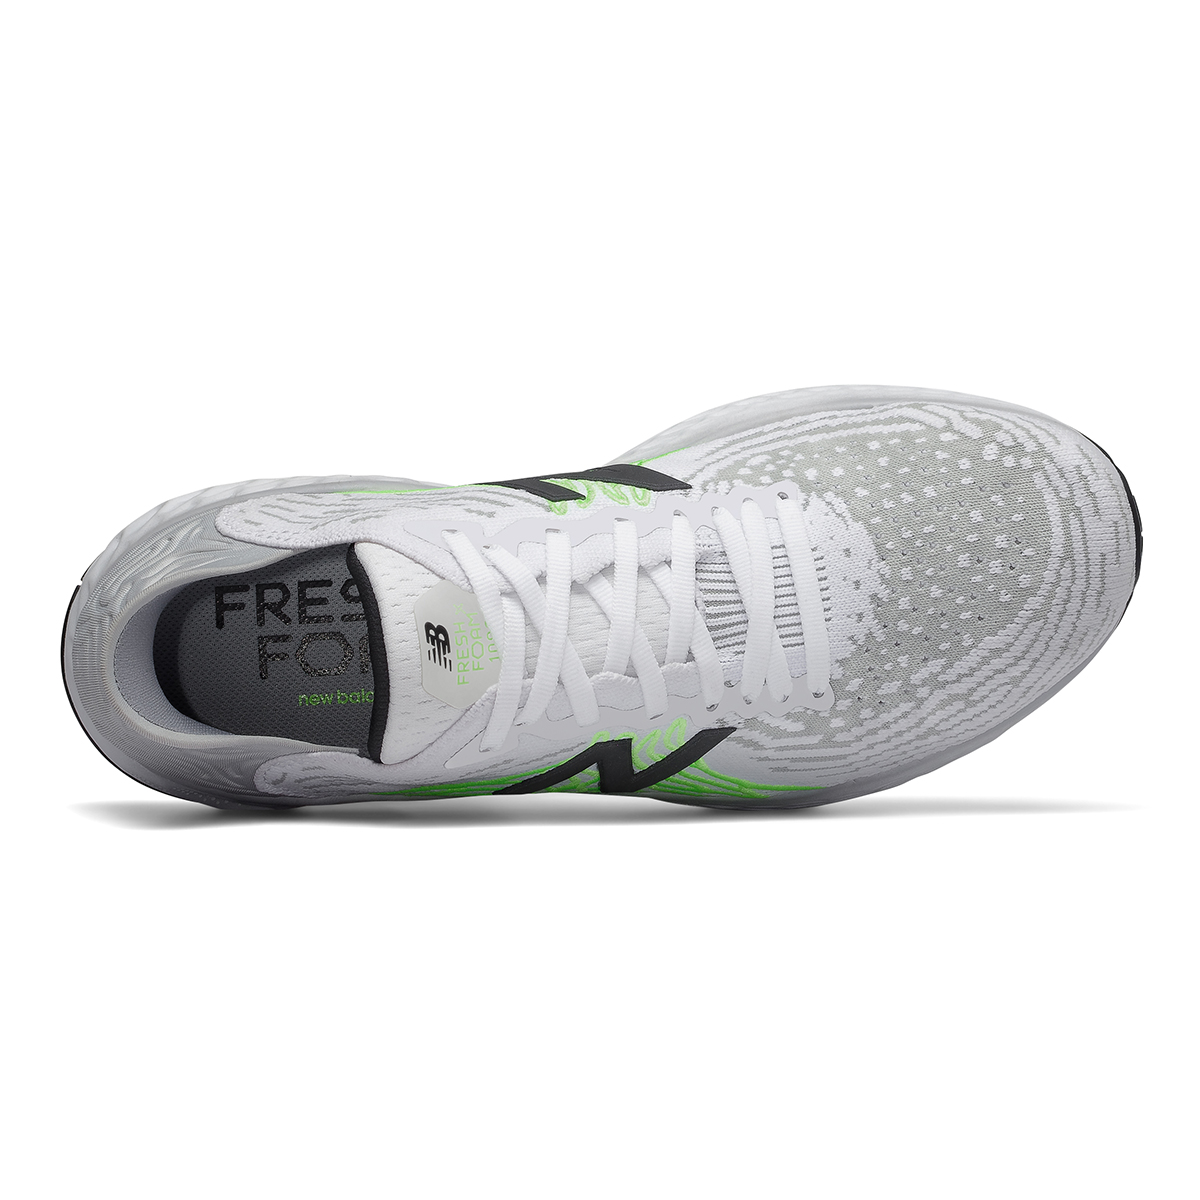 Men's New Balance Fresh Foam 1080v10 Running Shoe, , large, image 3